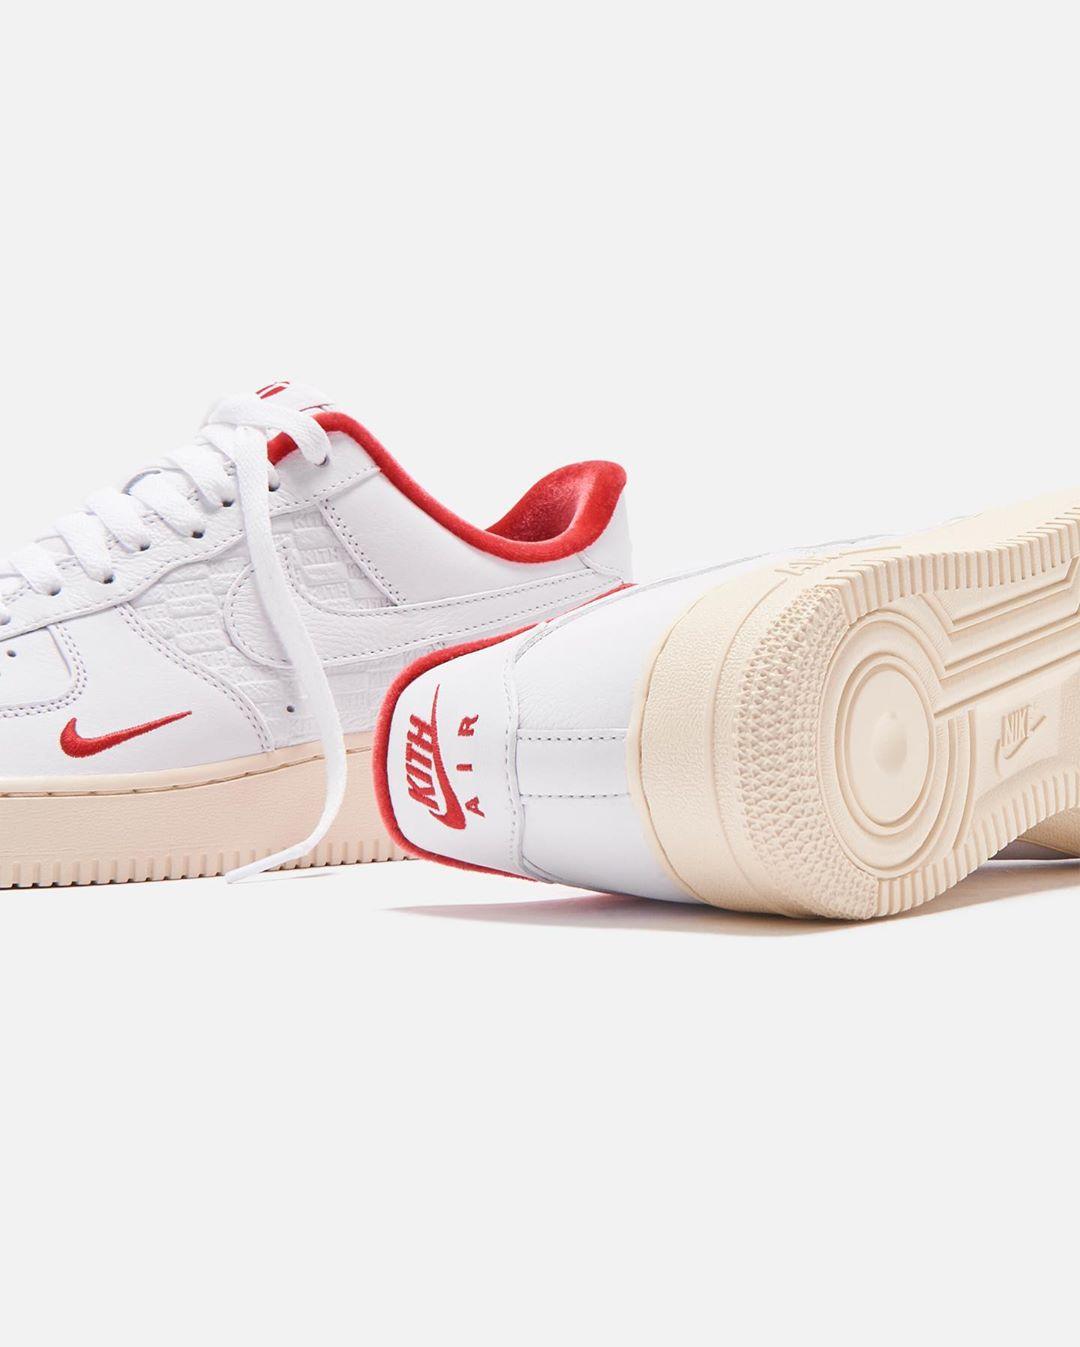 KITH junta se à Nike para novo par exclusivo de Air Force 1